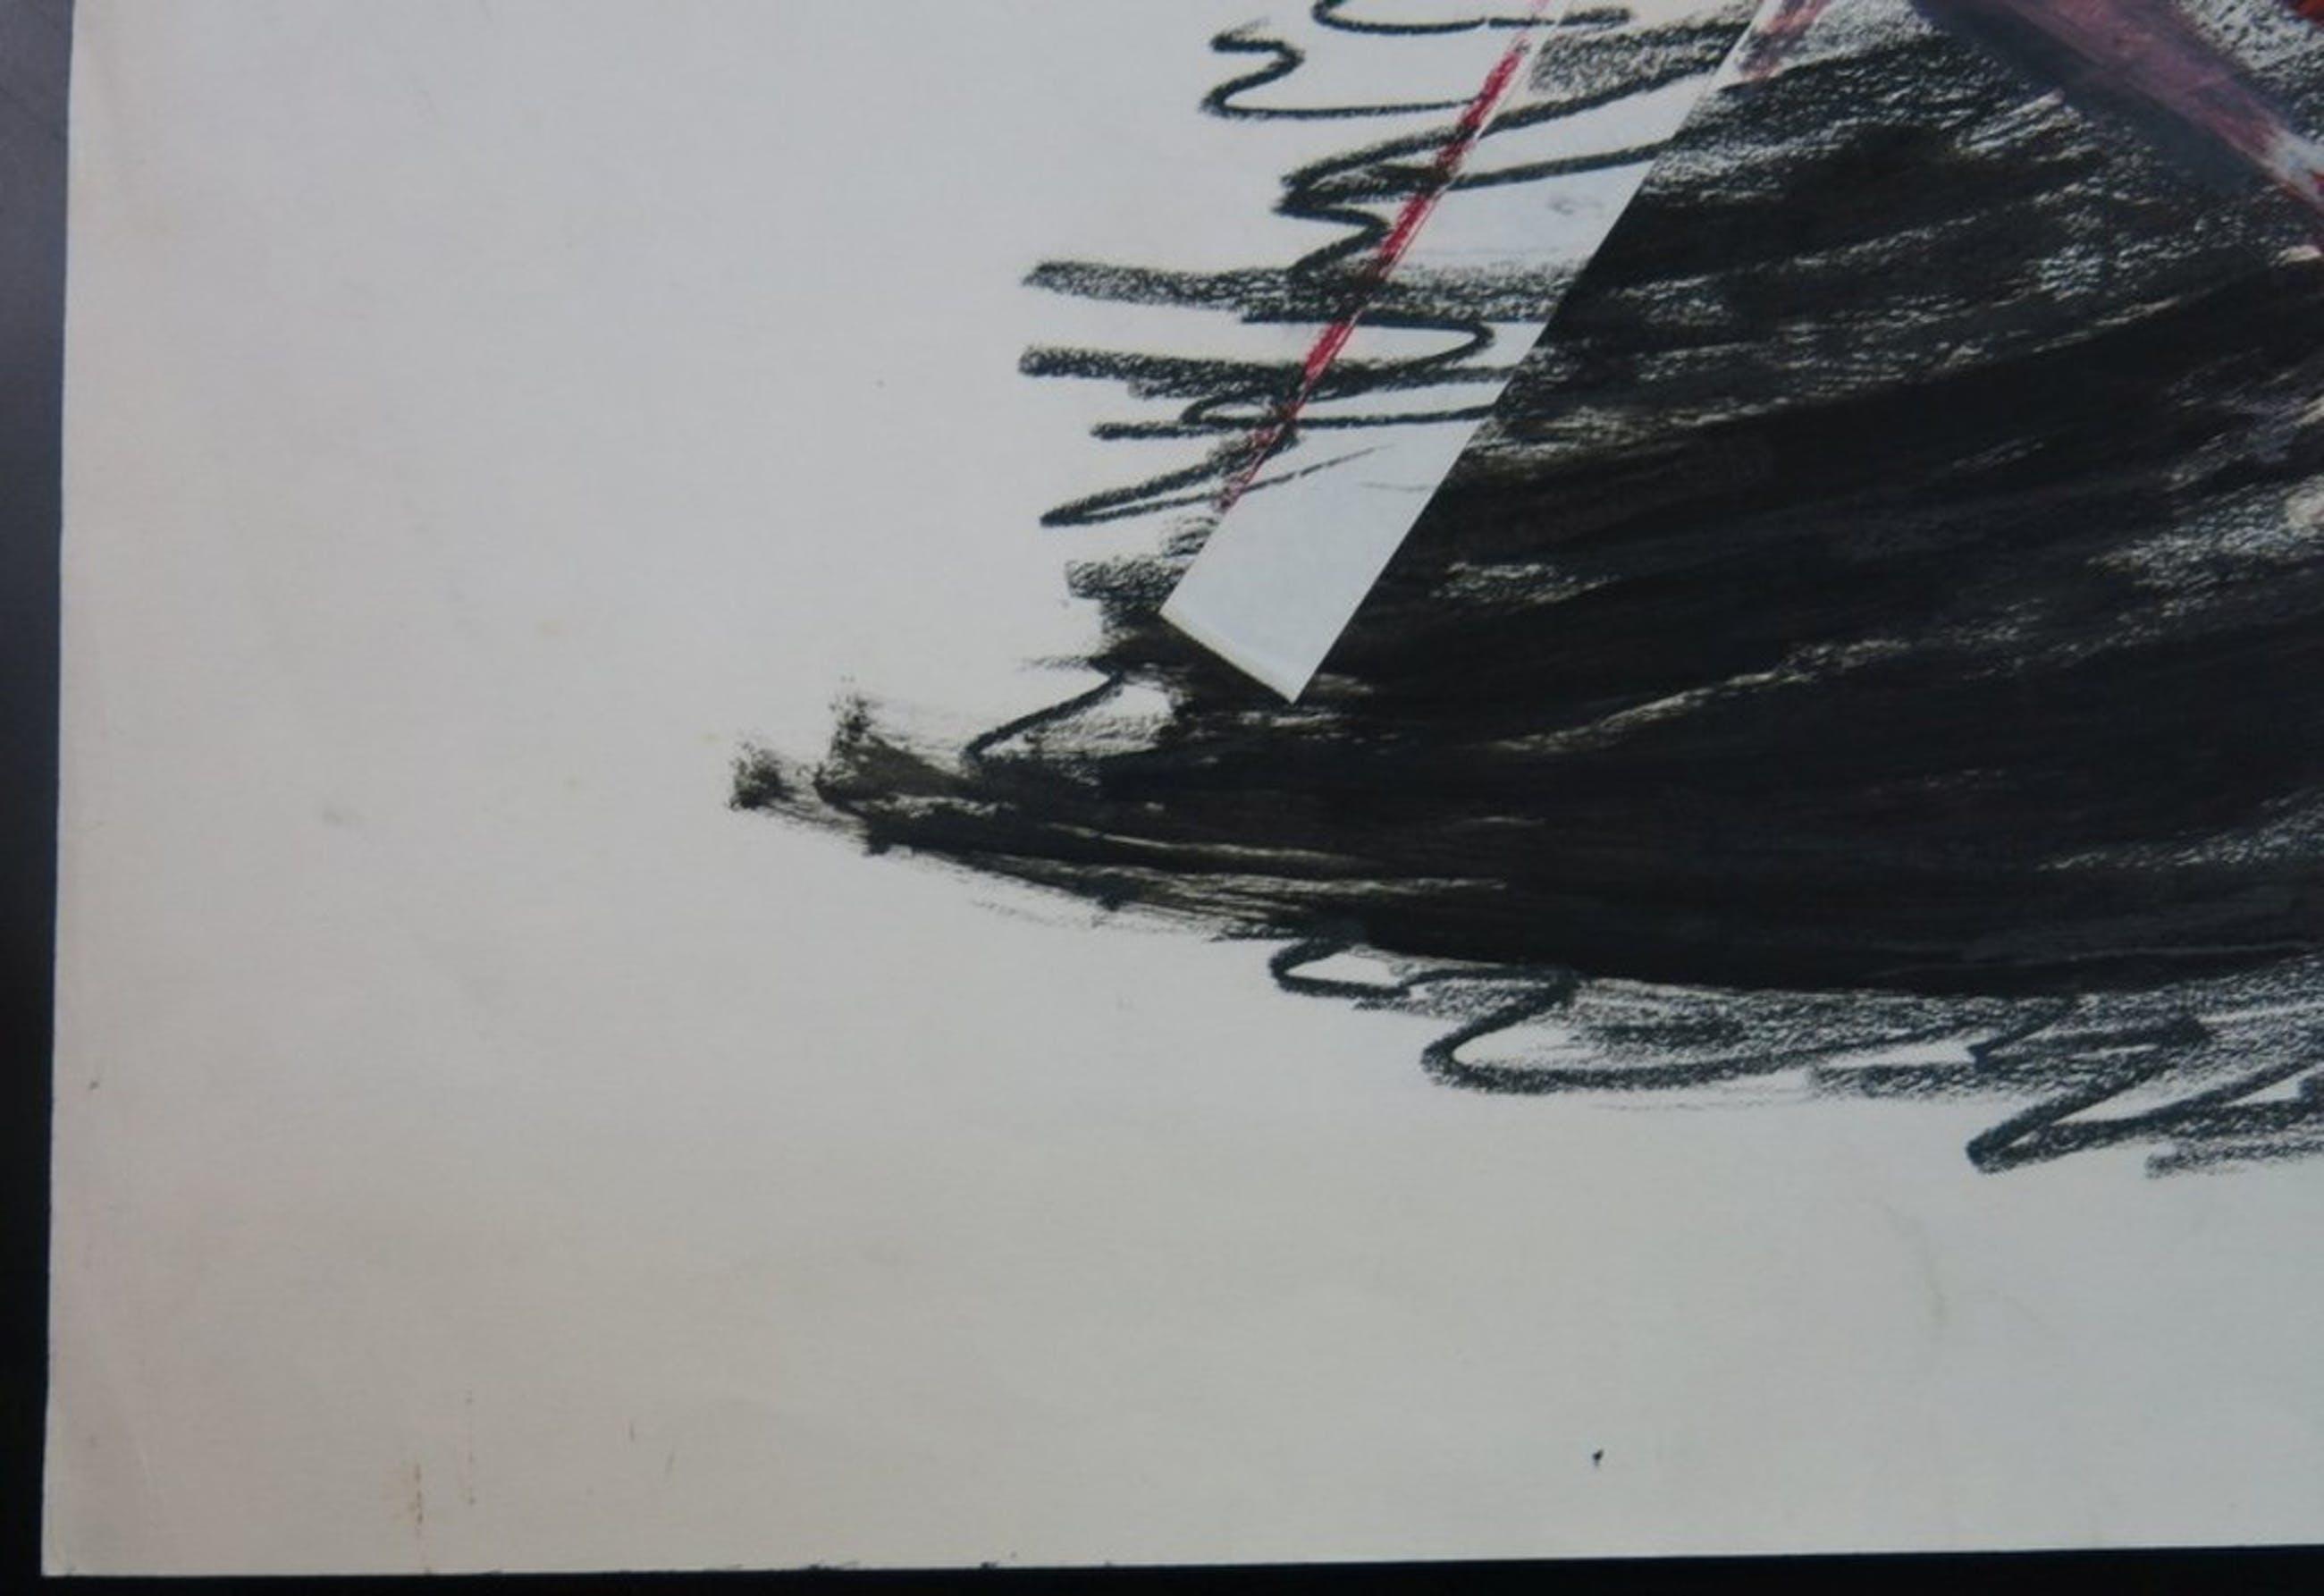 Onbekend gesigneerd: Gemengde techniek, Abstracte voorstelling kopen? Bied vanaf 1!